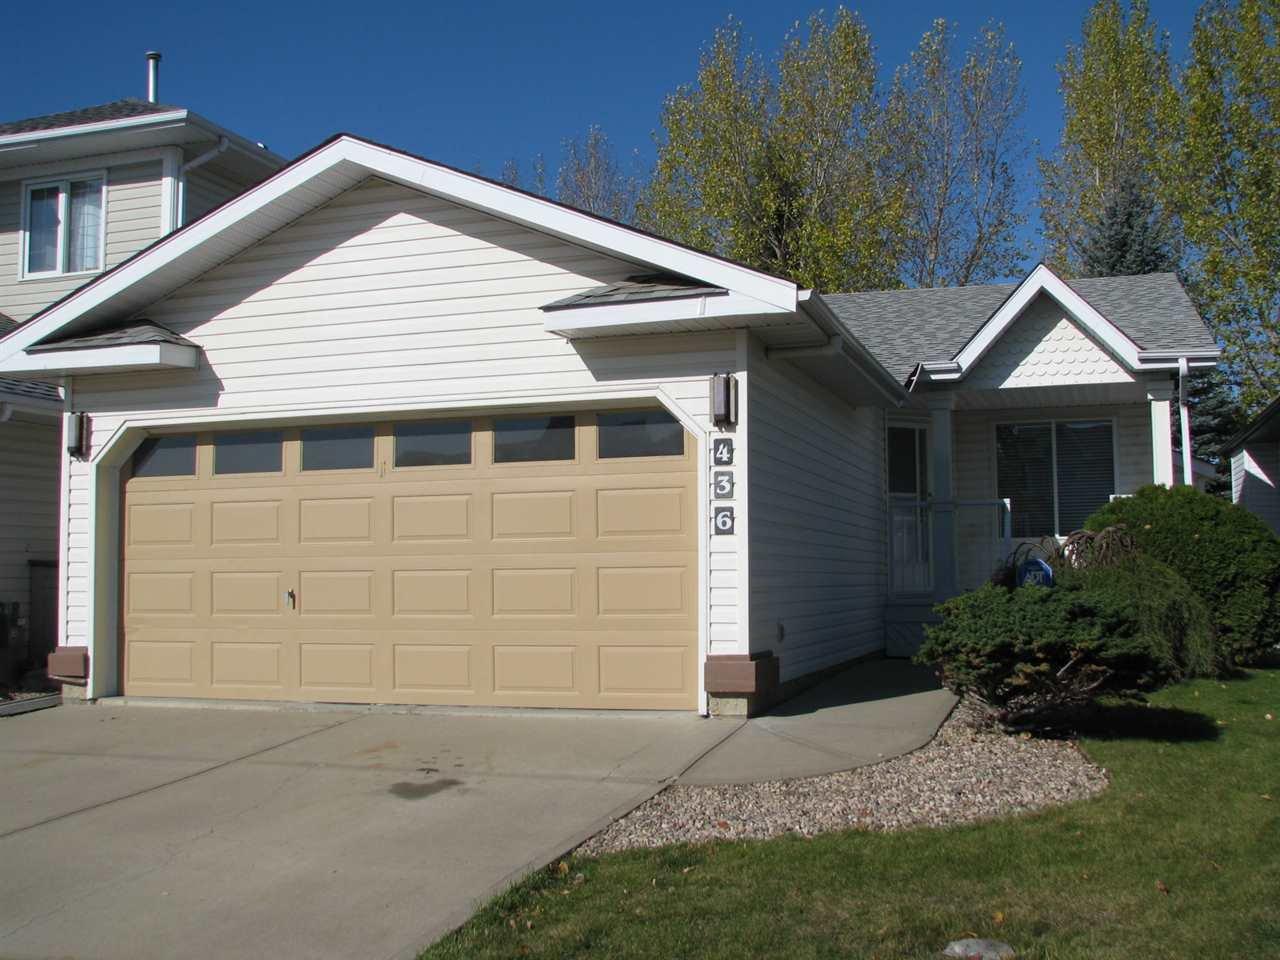 Main Photo: 436 Breckenridge Lane in Edmonton: Zone 58 House for sale : MLS®# E4176059